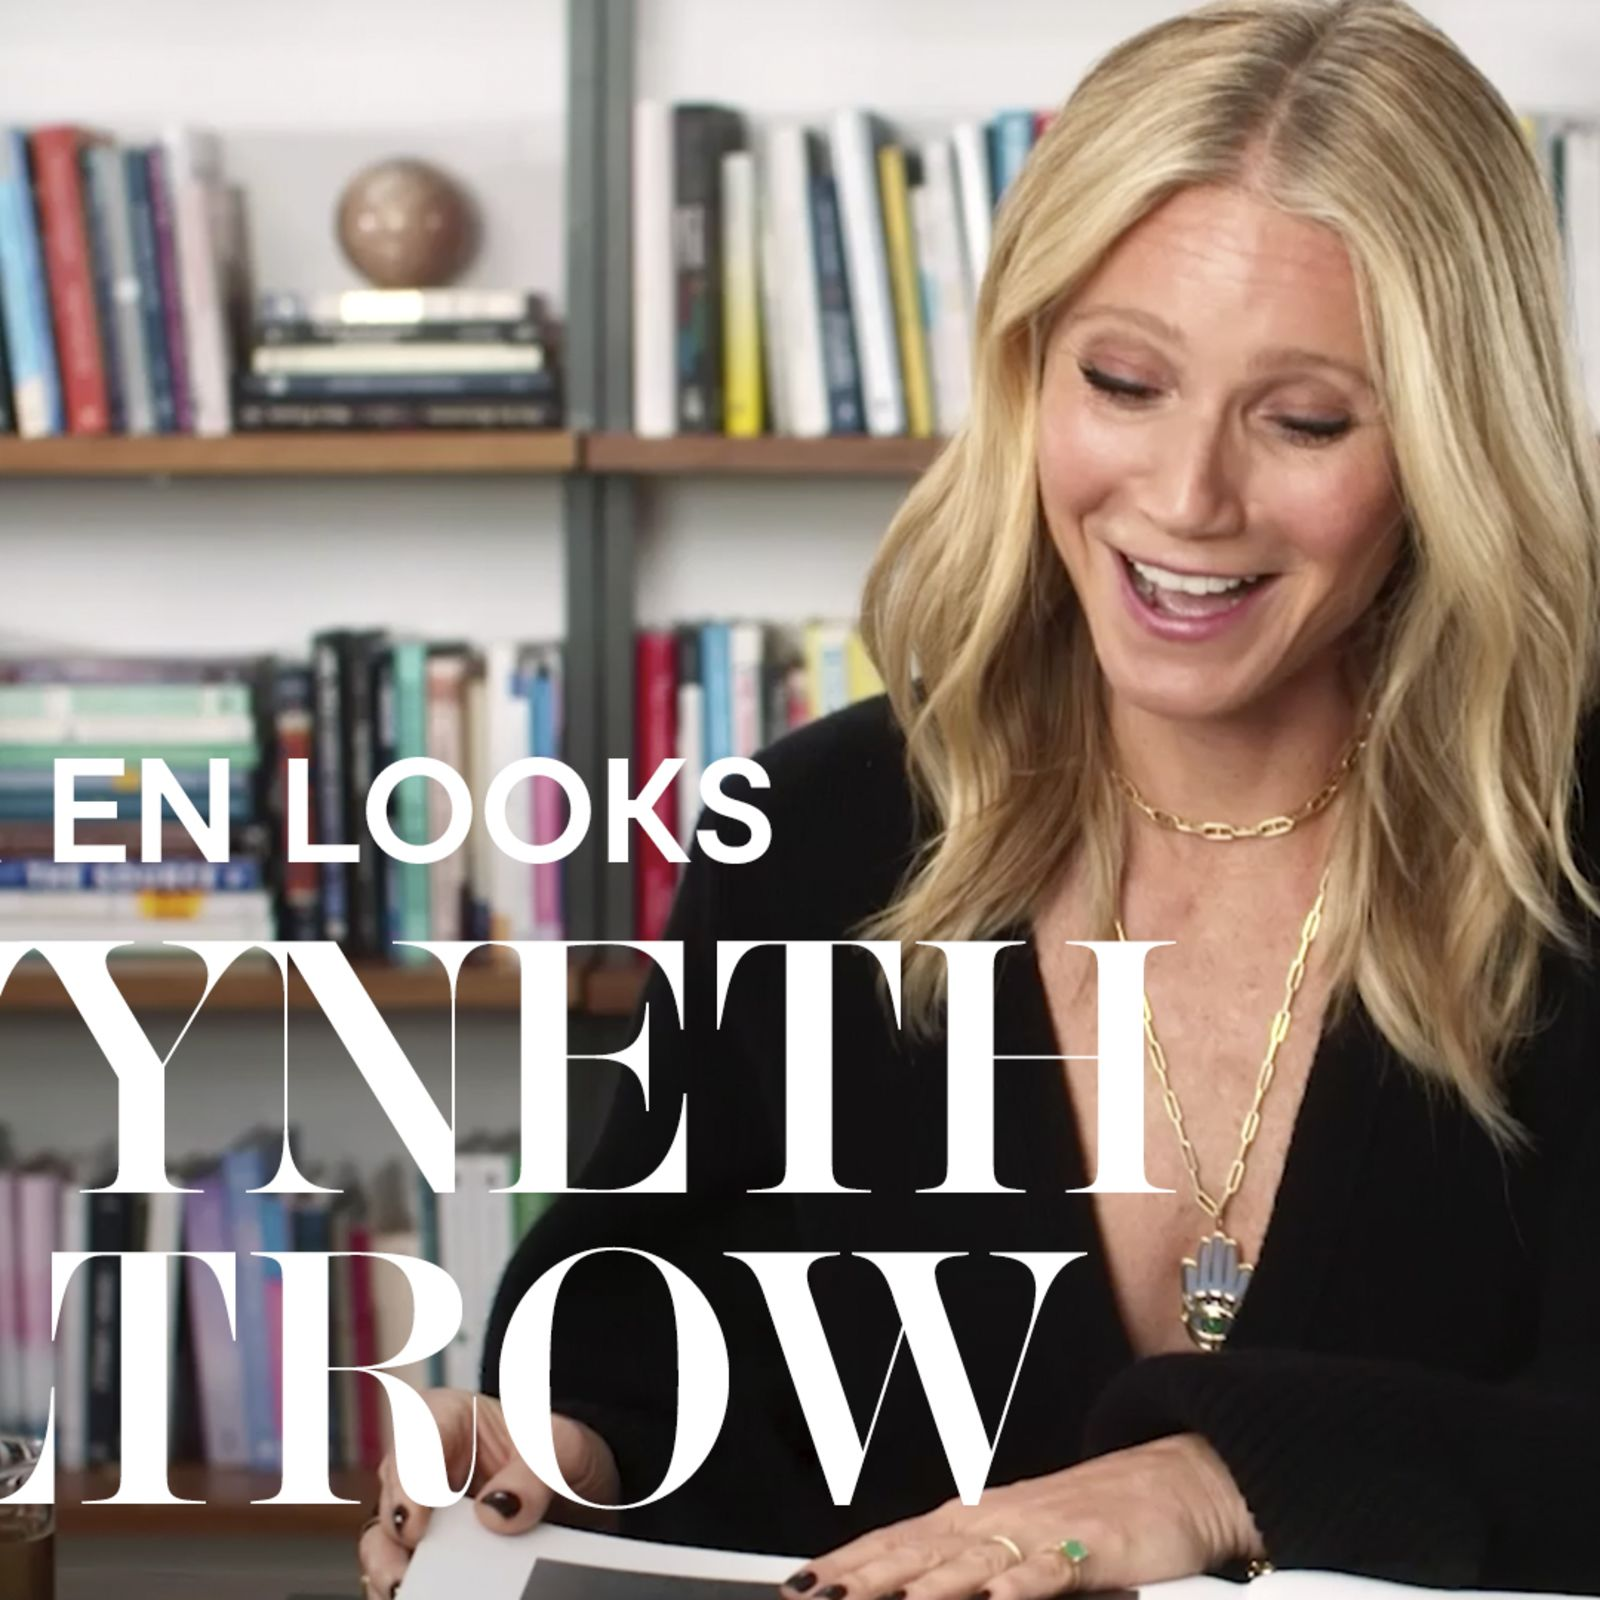 Gwyneth Paltrow: Mi vida en looks